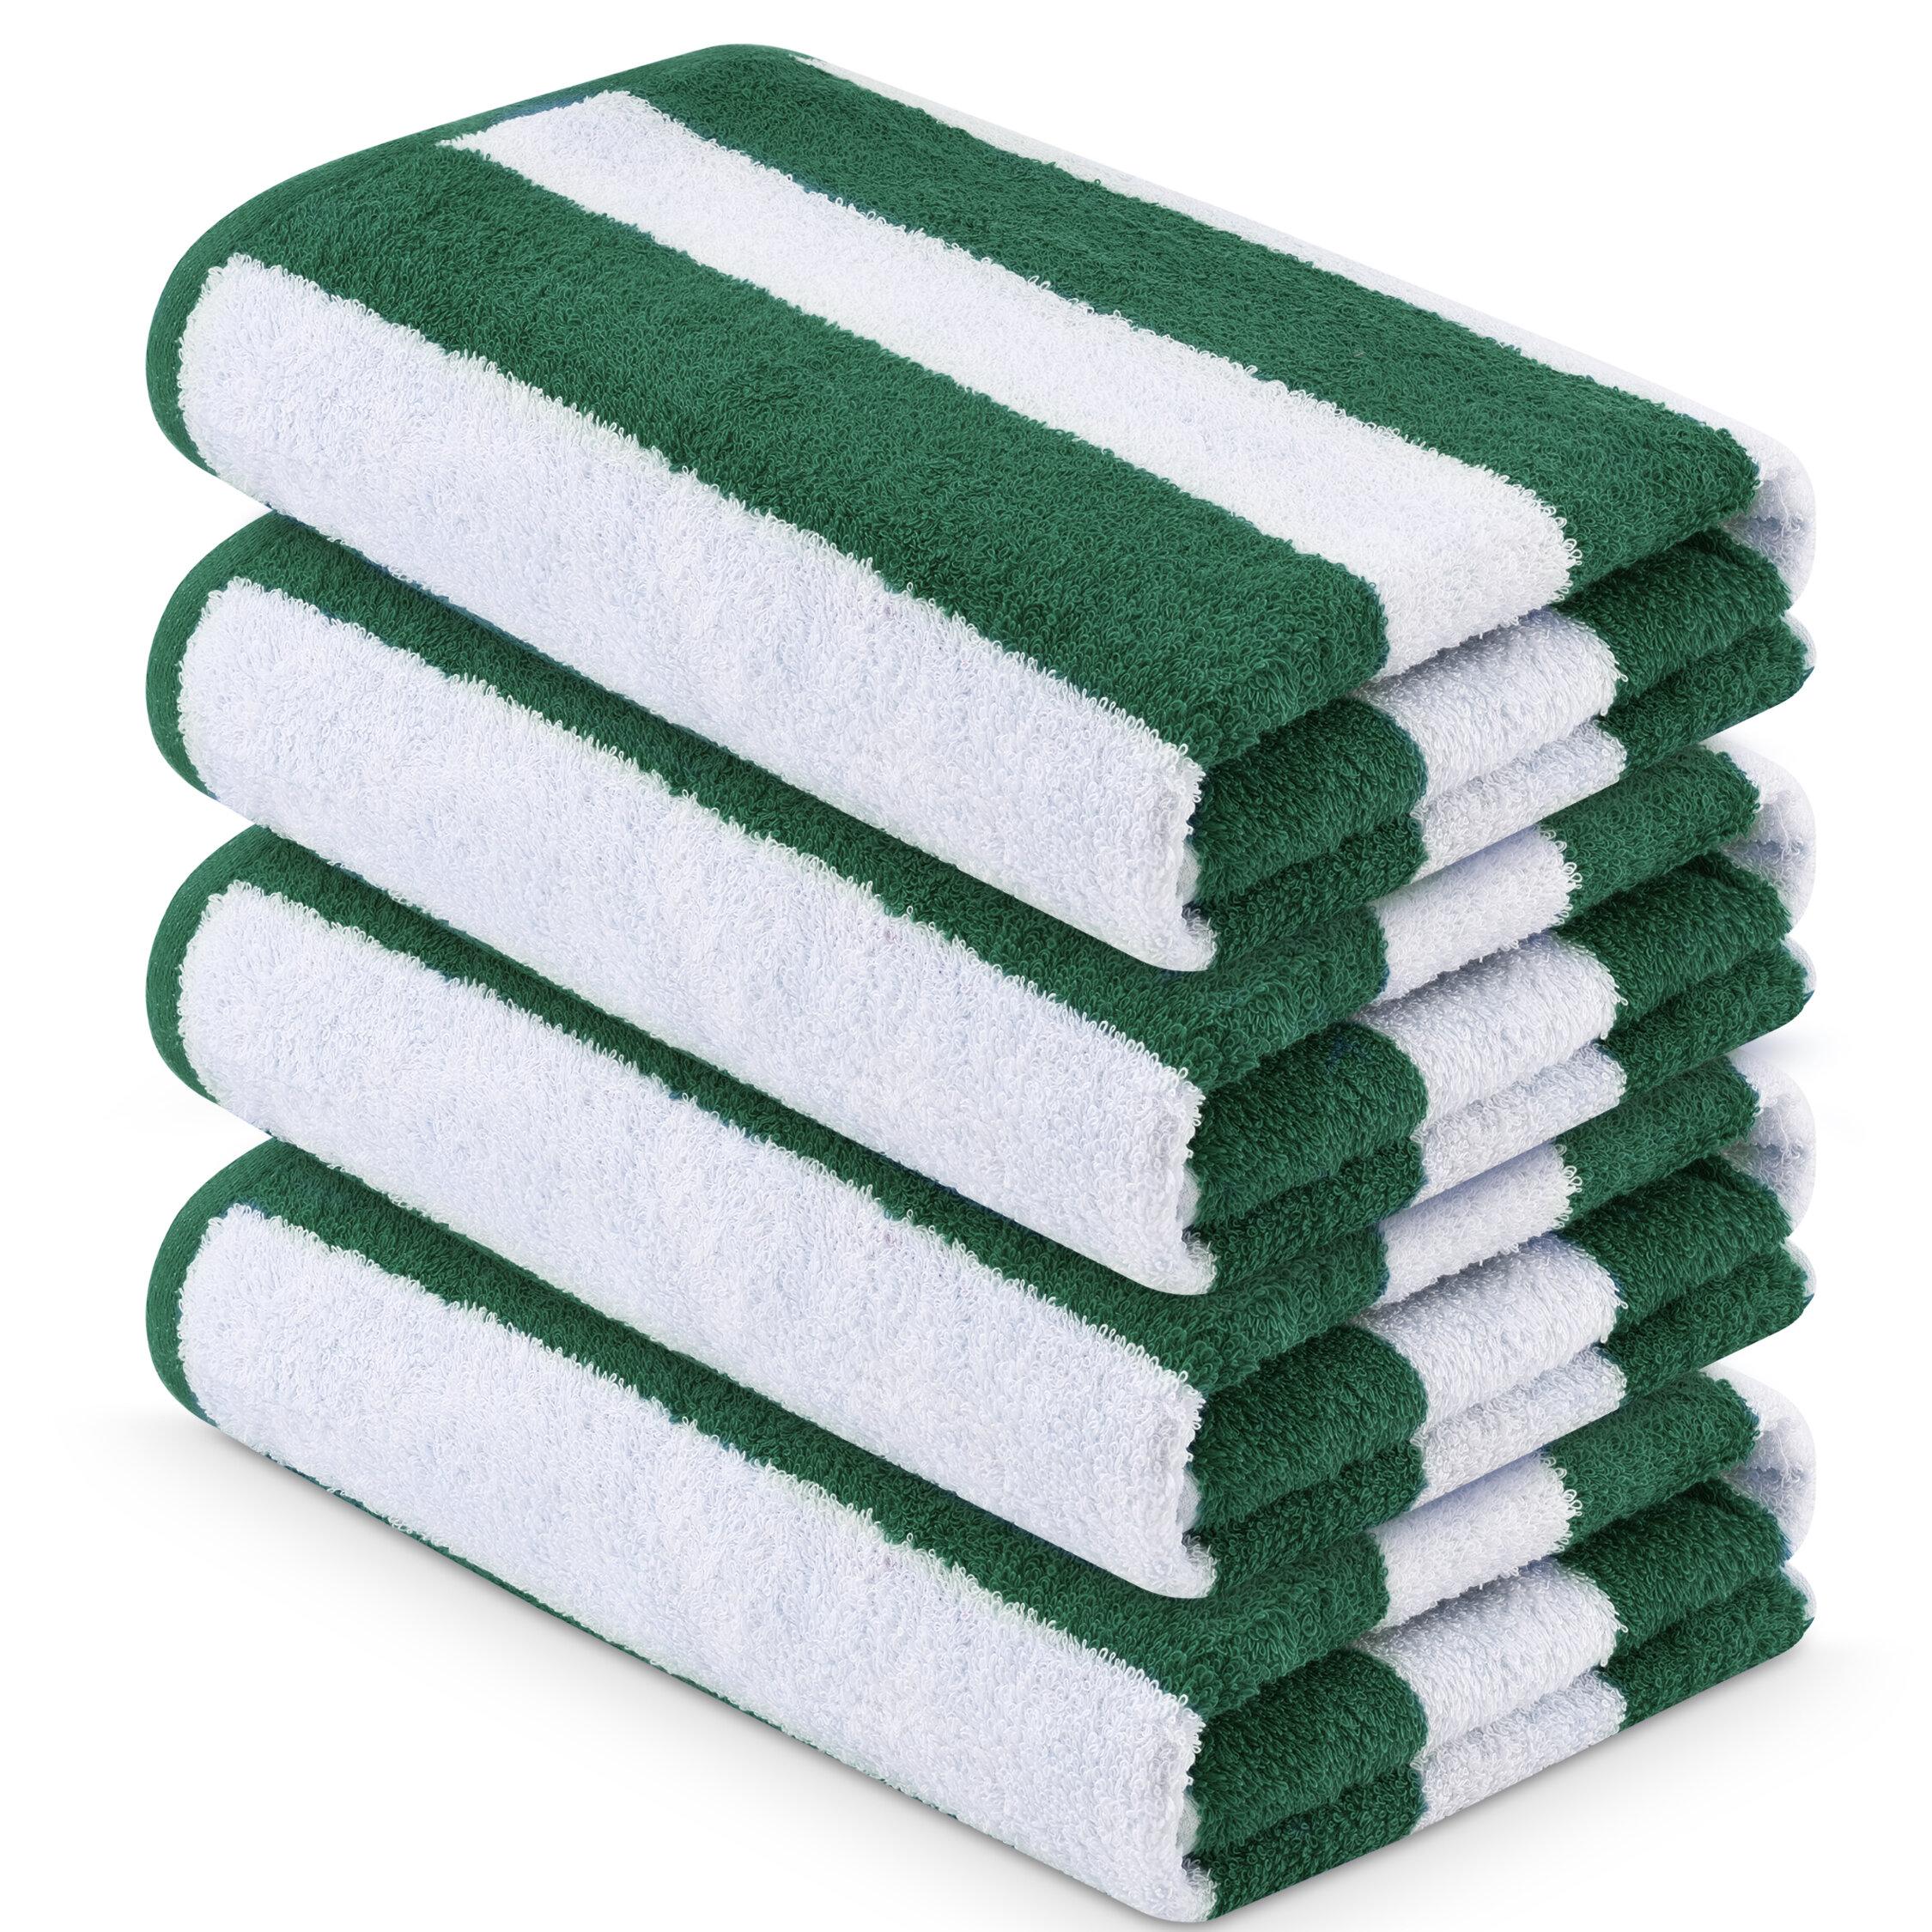 Sheridan Cancun 100/% Upcycled Cotton Yarns Beach Towel 100x180cm